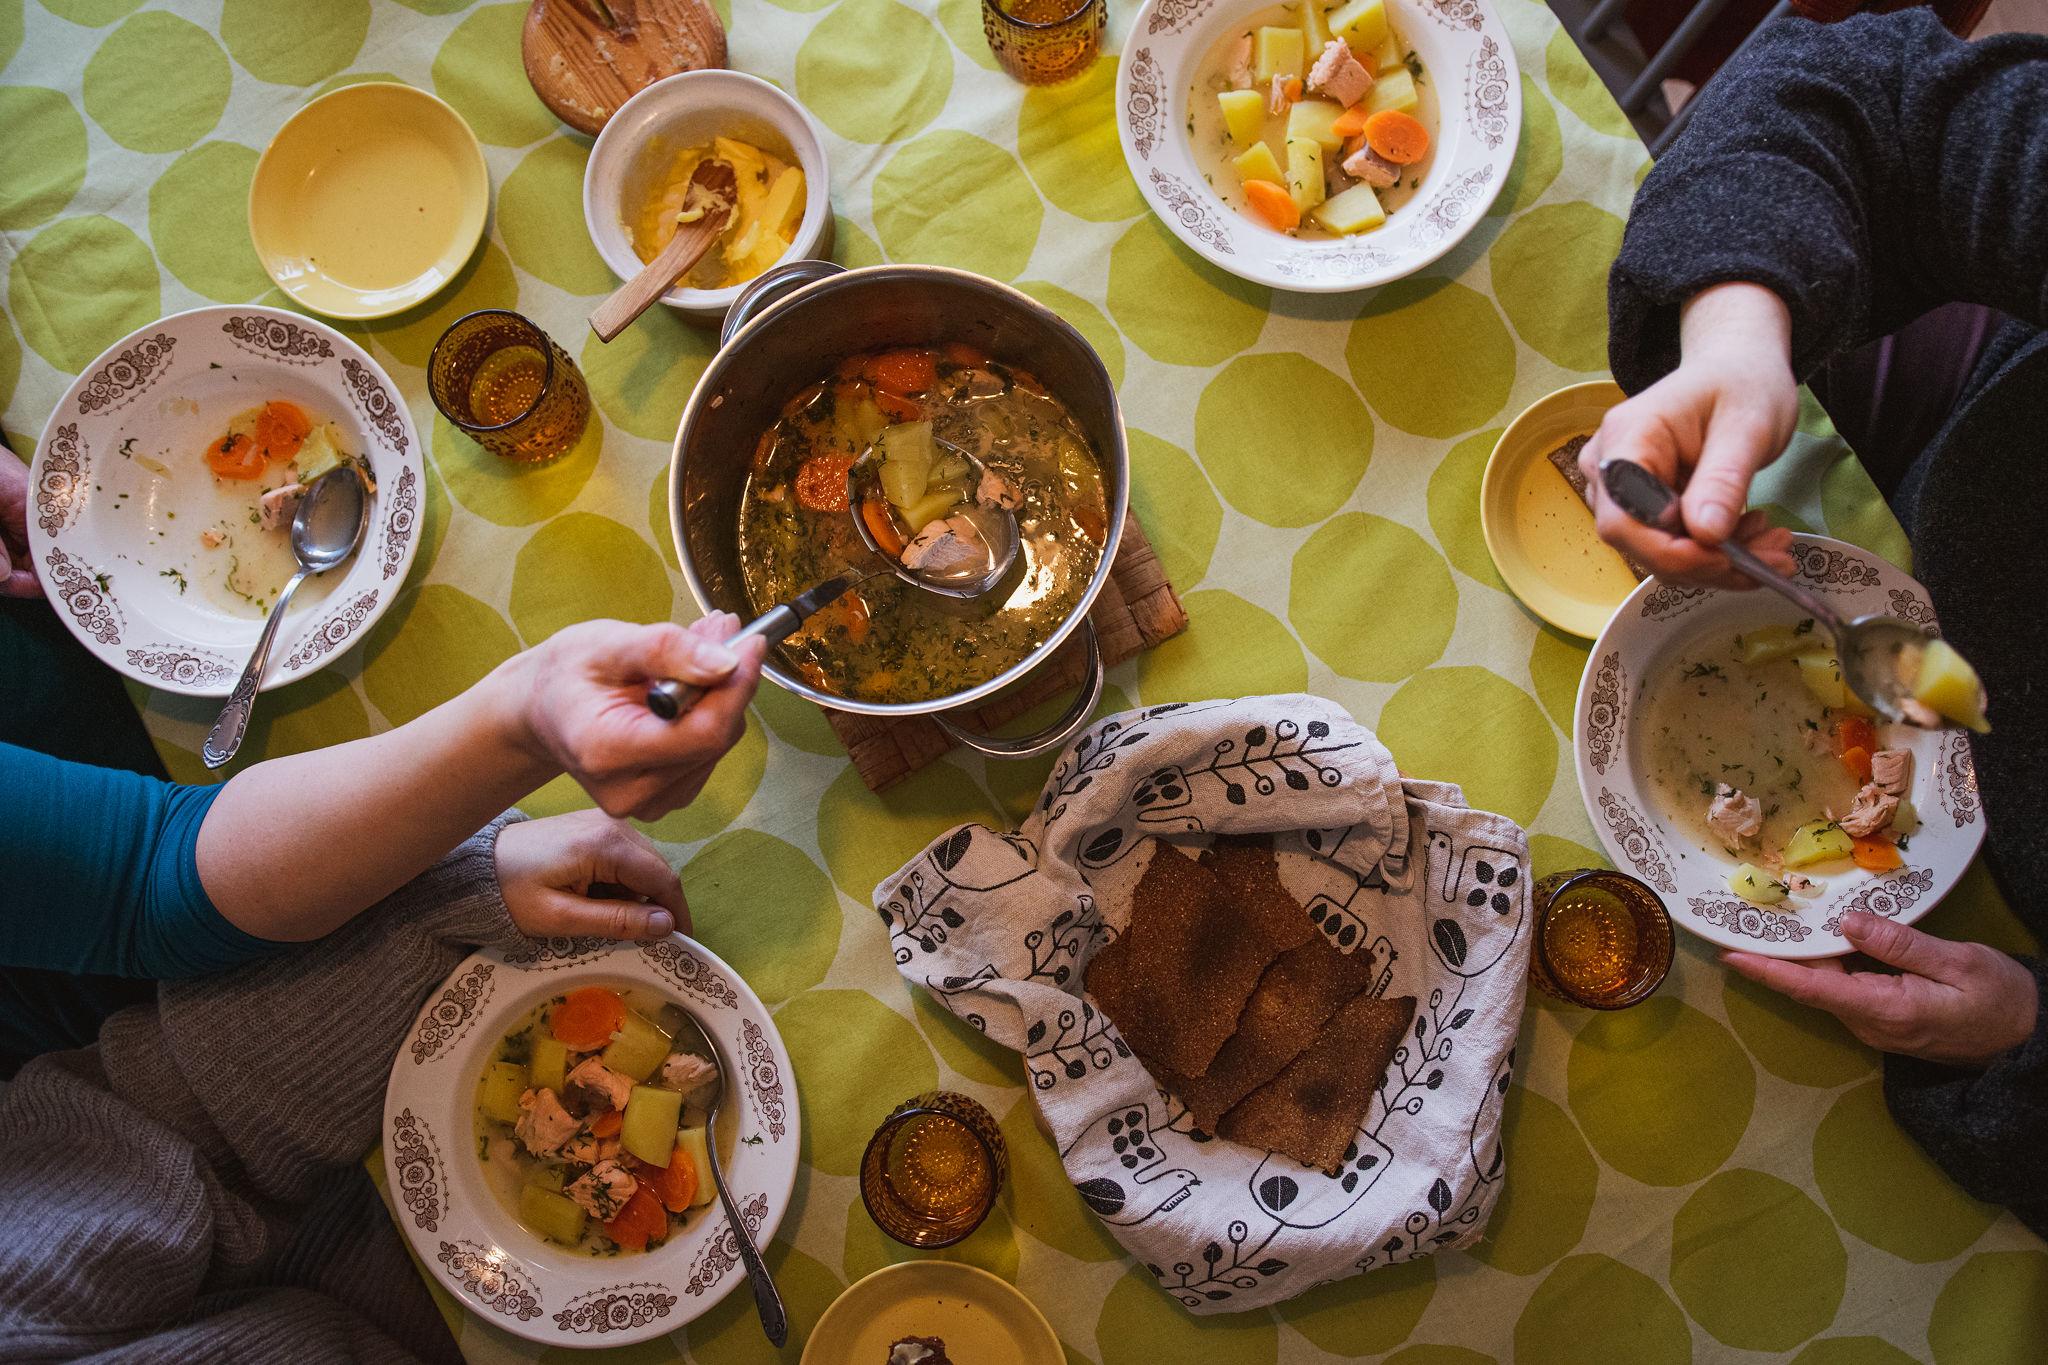 saimaaLife ladies enjoying traditional Finnish salmon soup with rye cracker